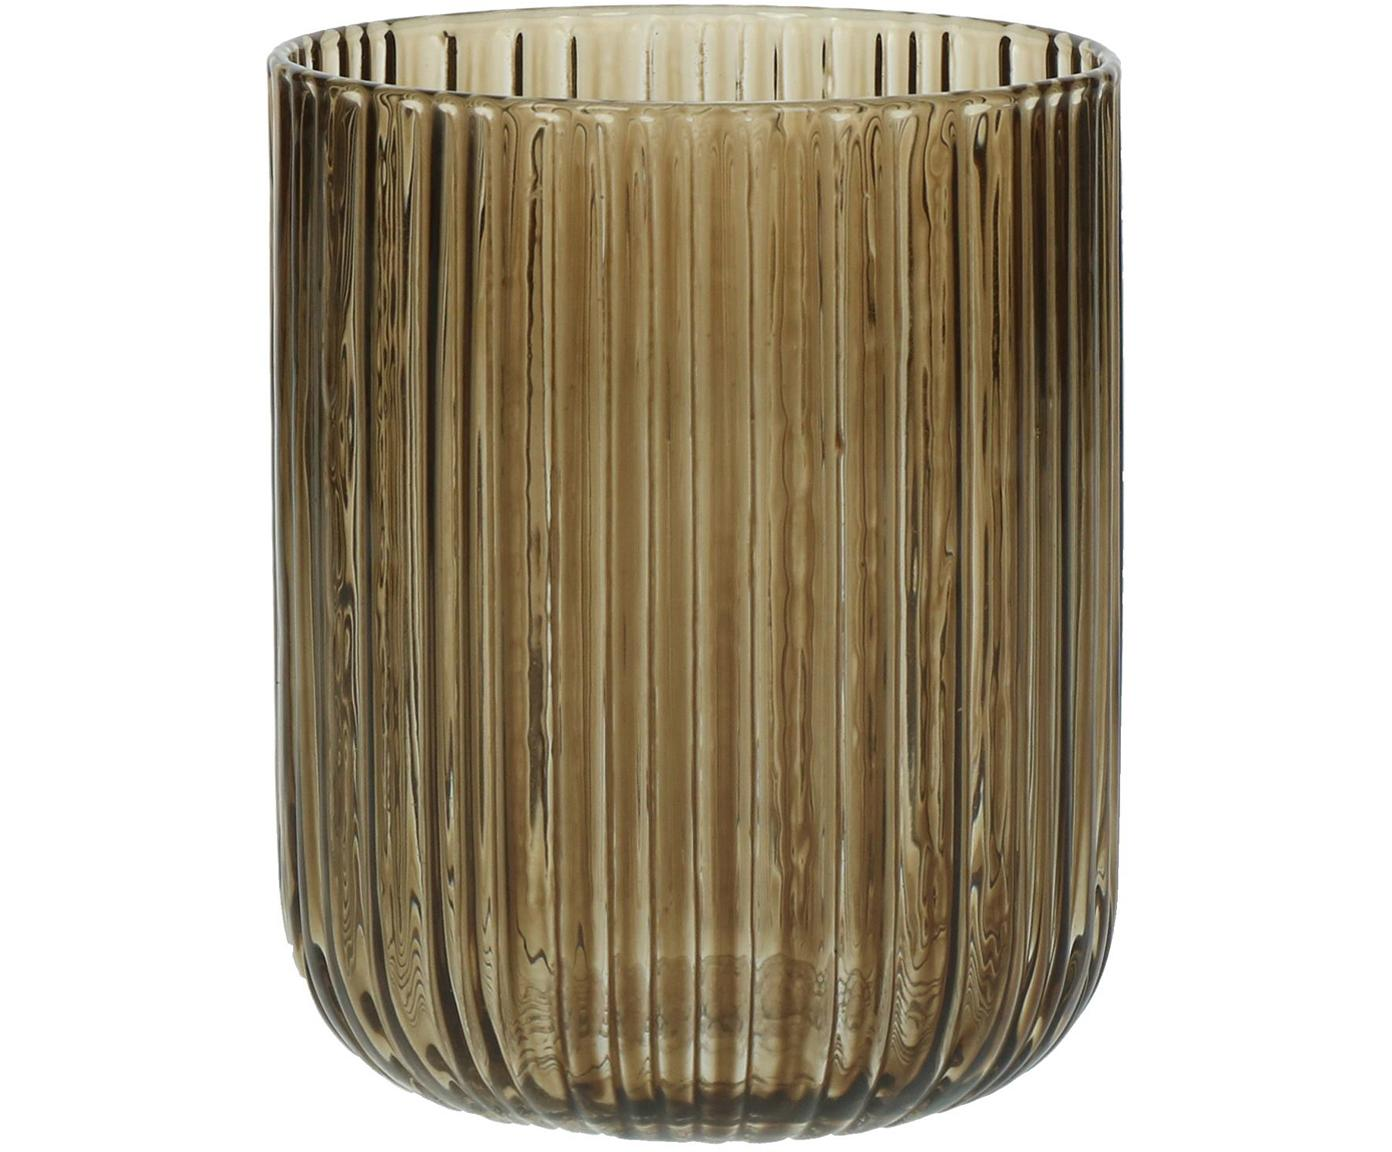 Vasos con relive Canise, 6uds., Vidrio, Ámbar, Ø 8 x Al 9 cm